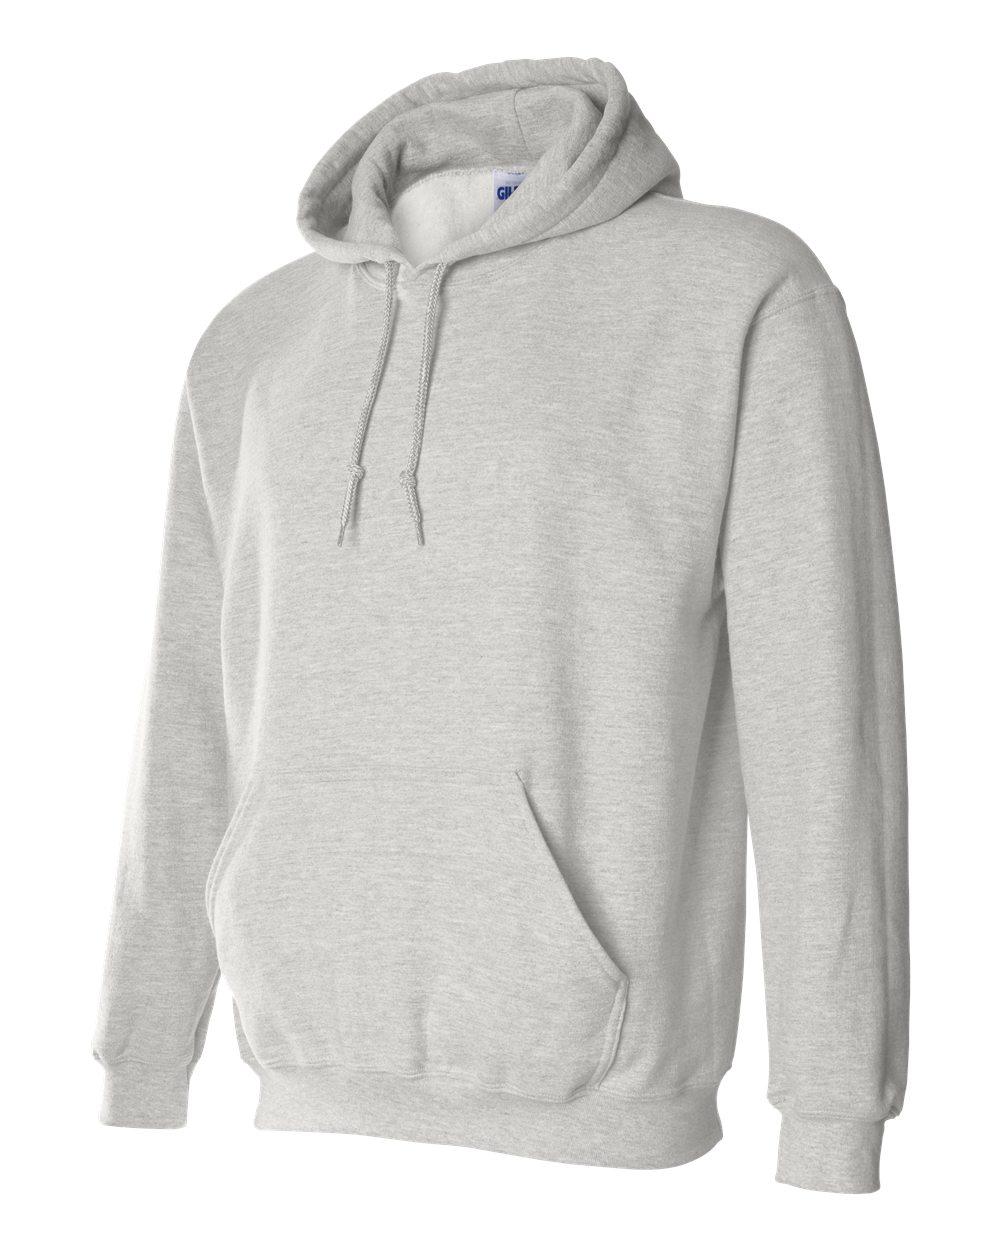 Gildan Heavy Blend Hooded Sweatshirt GI18500 Ash